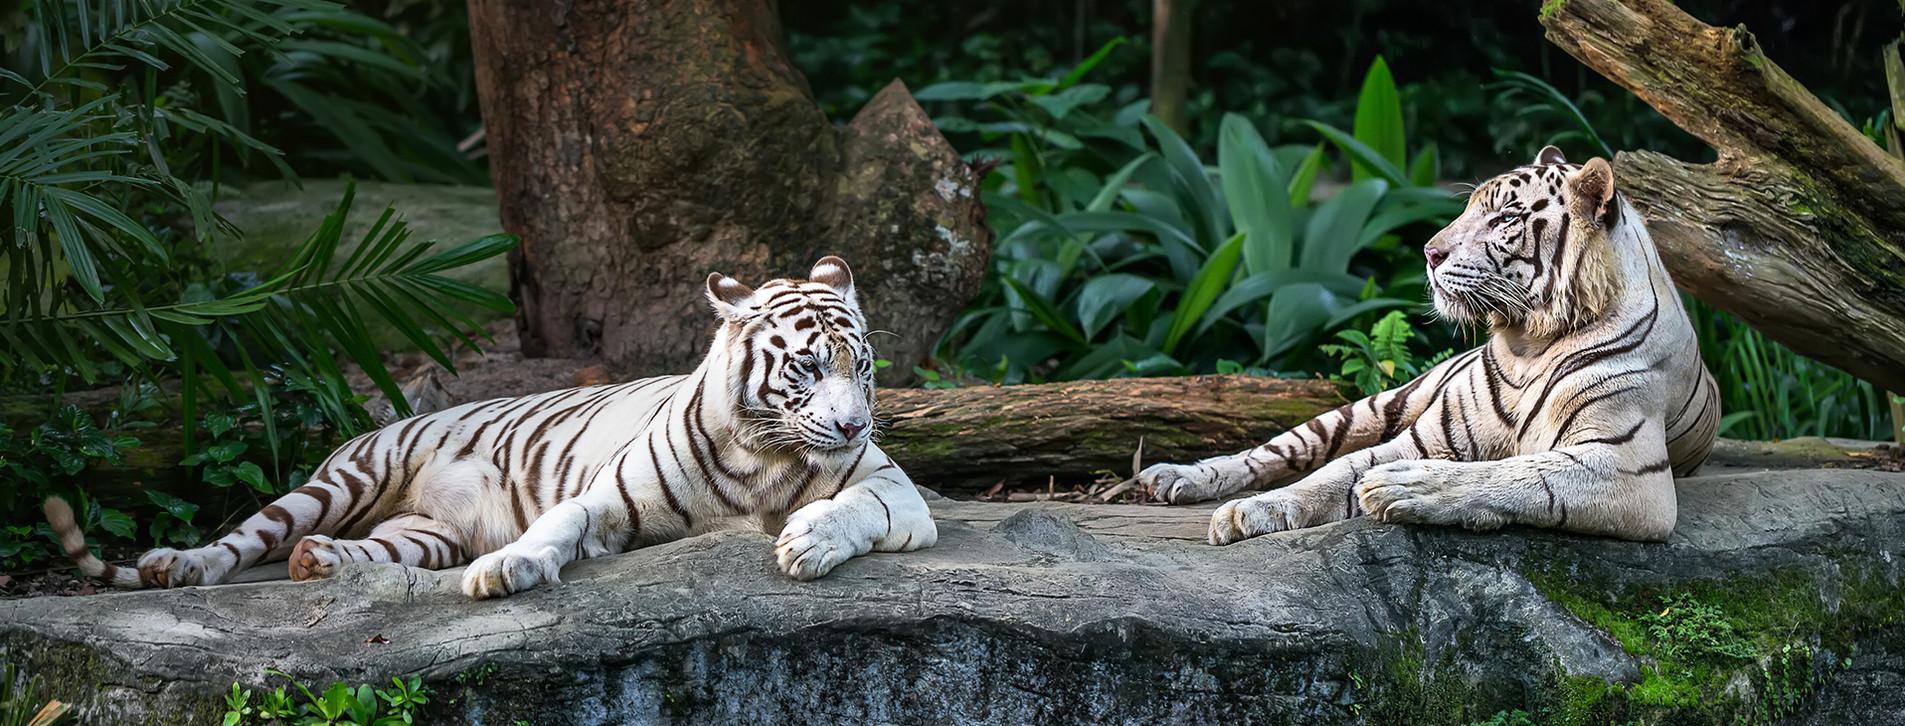 Фото 1 - Зоопарк «Лимпопо» для компании